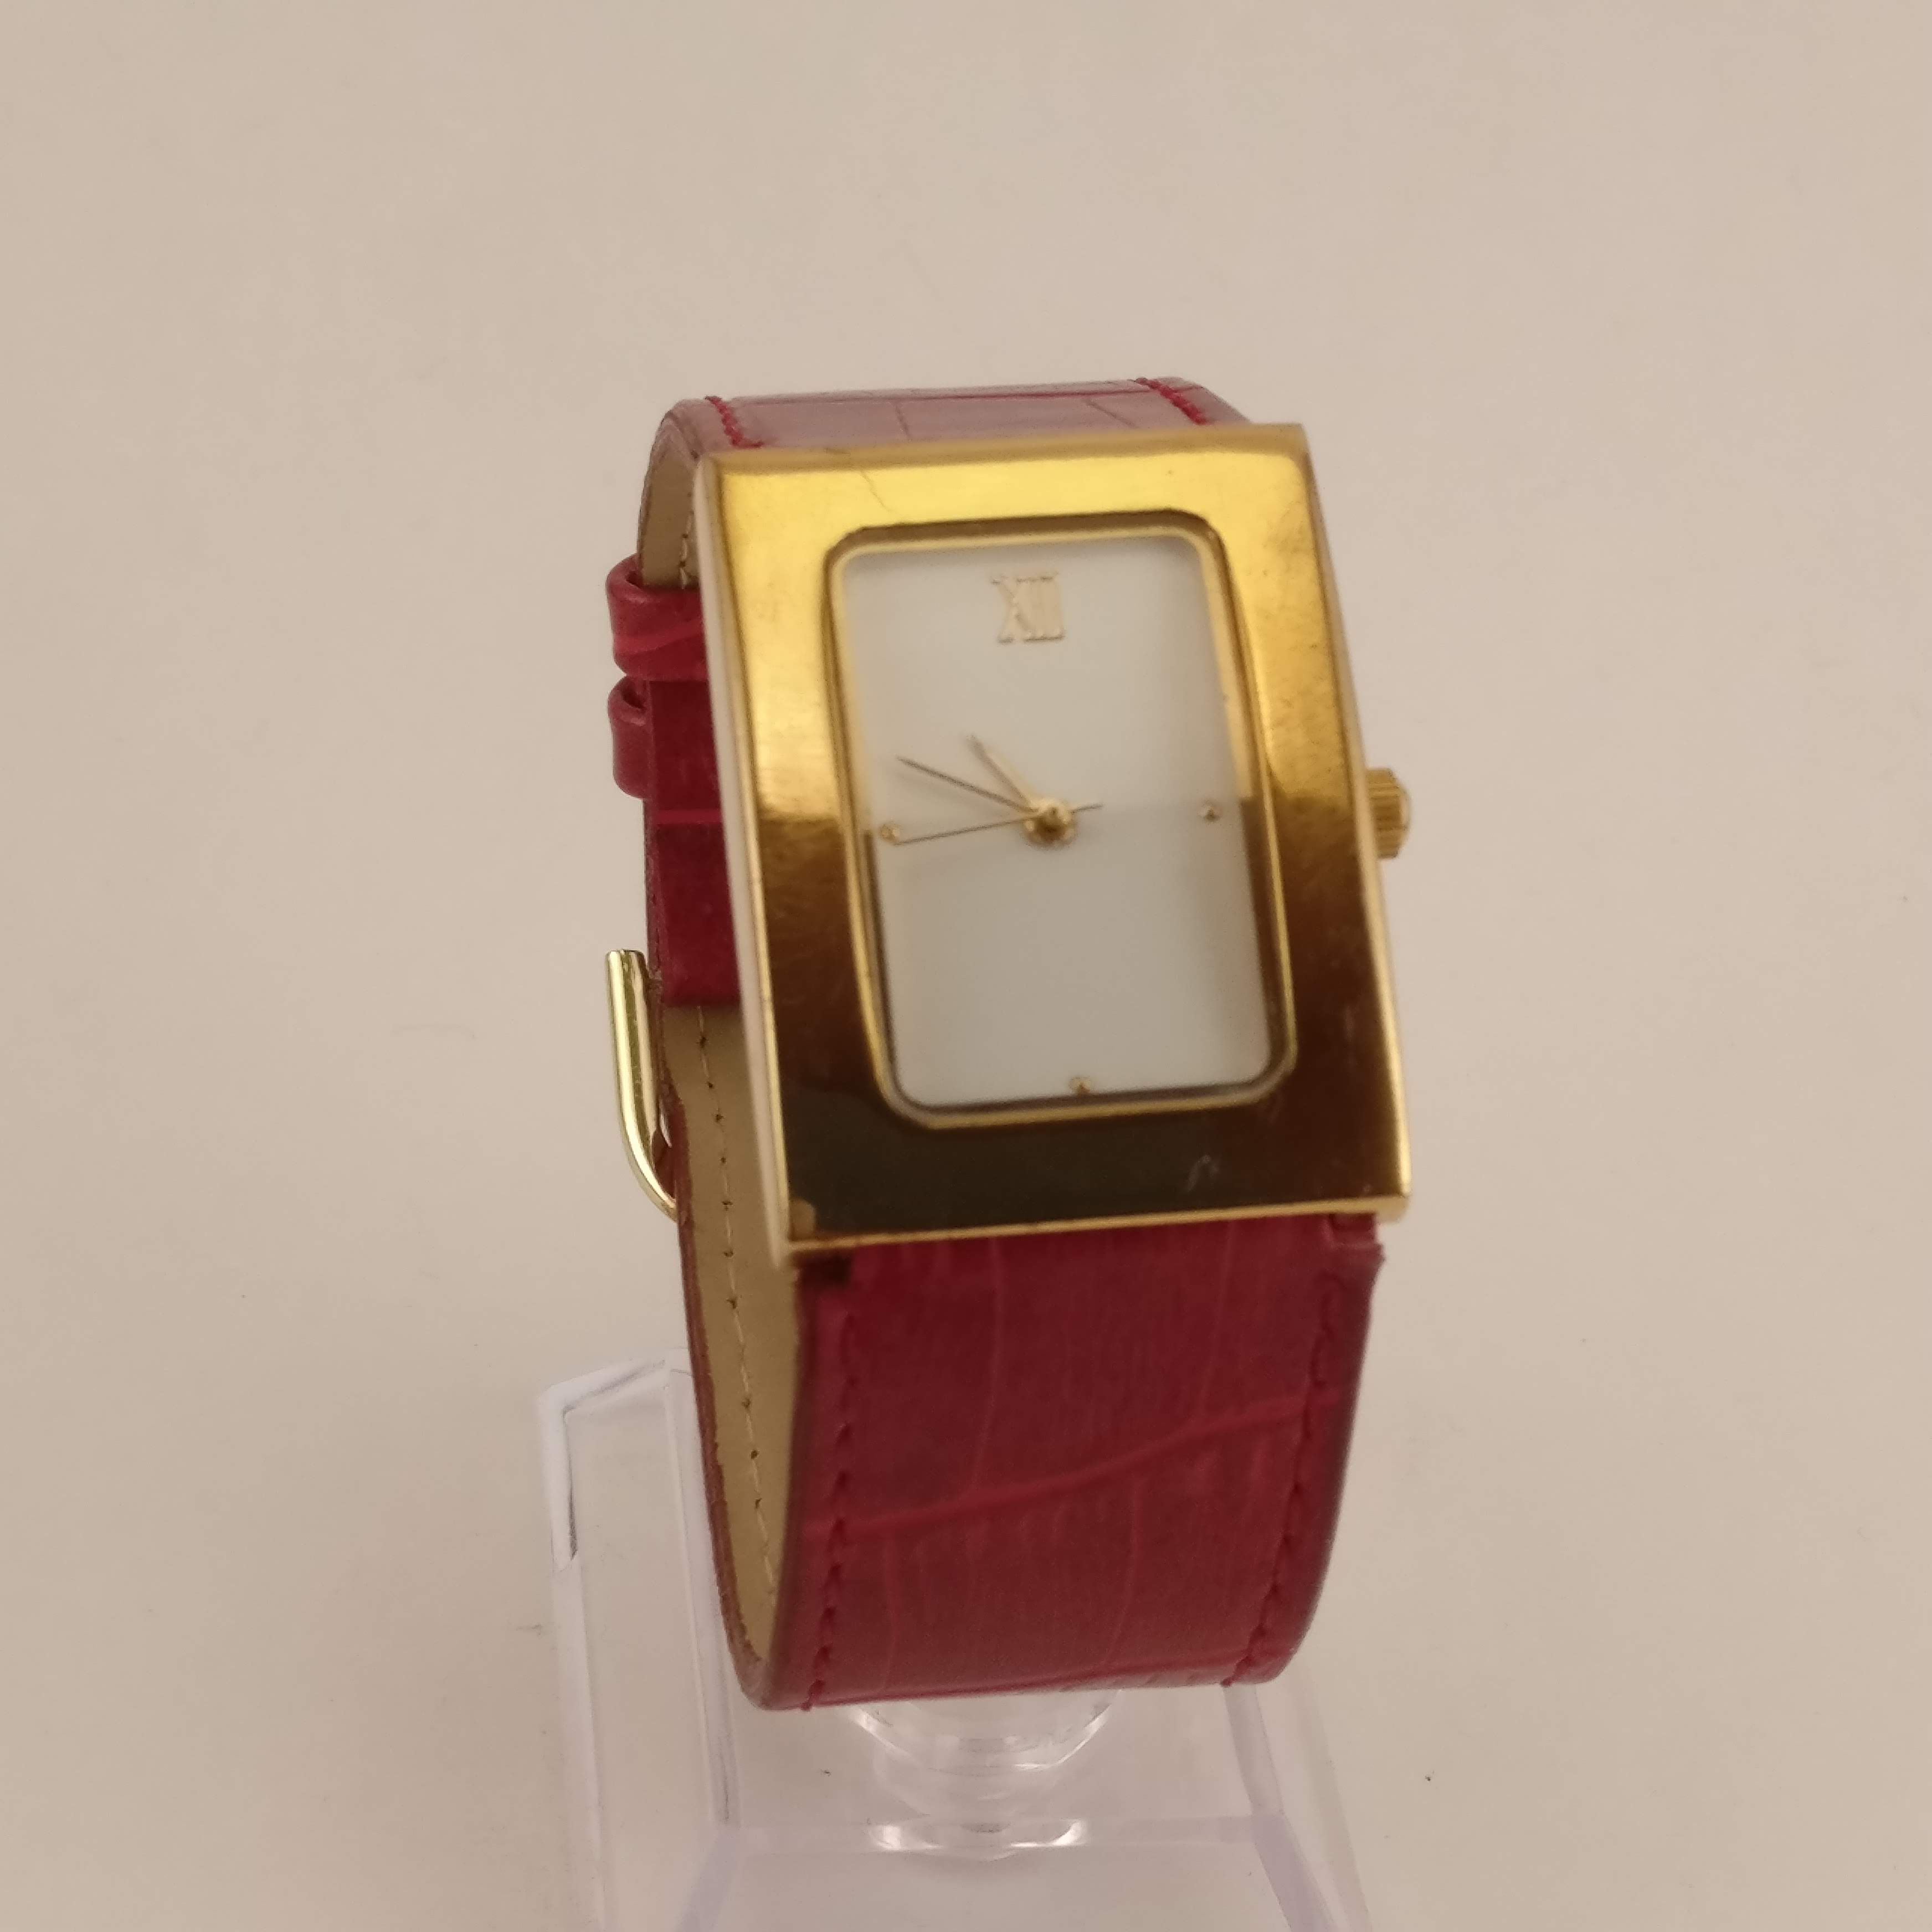 Nieuw Dames Horloge, Rode brede band GZ-18